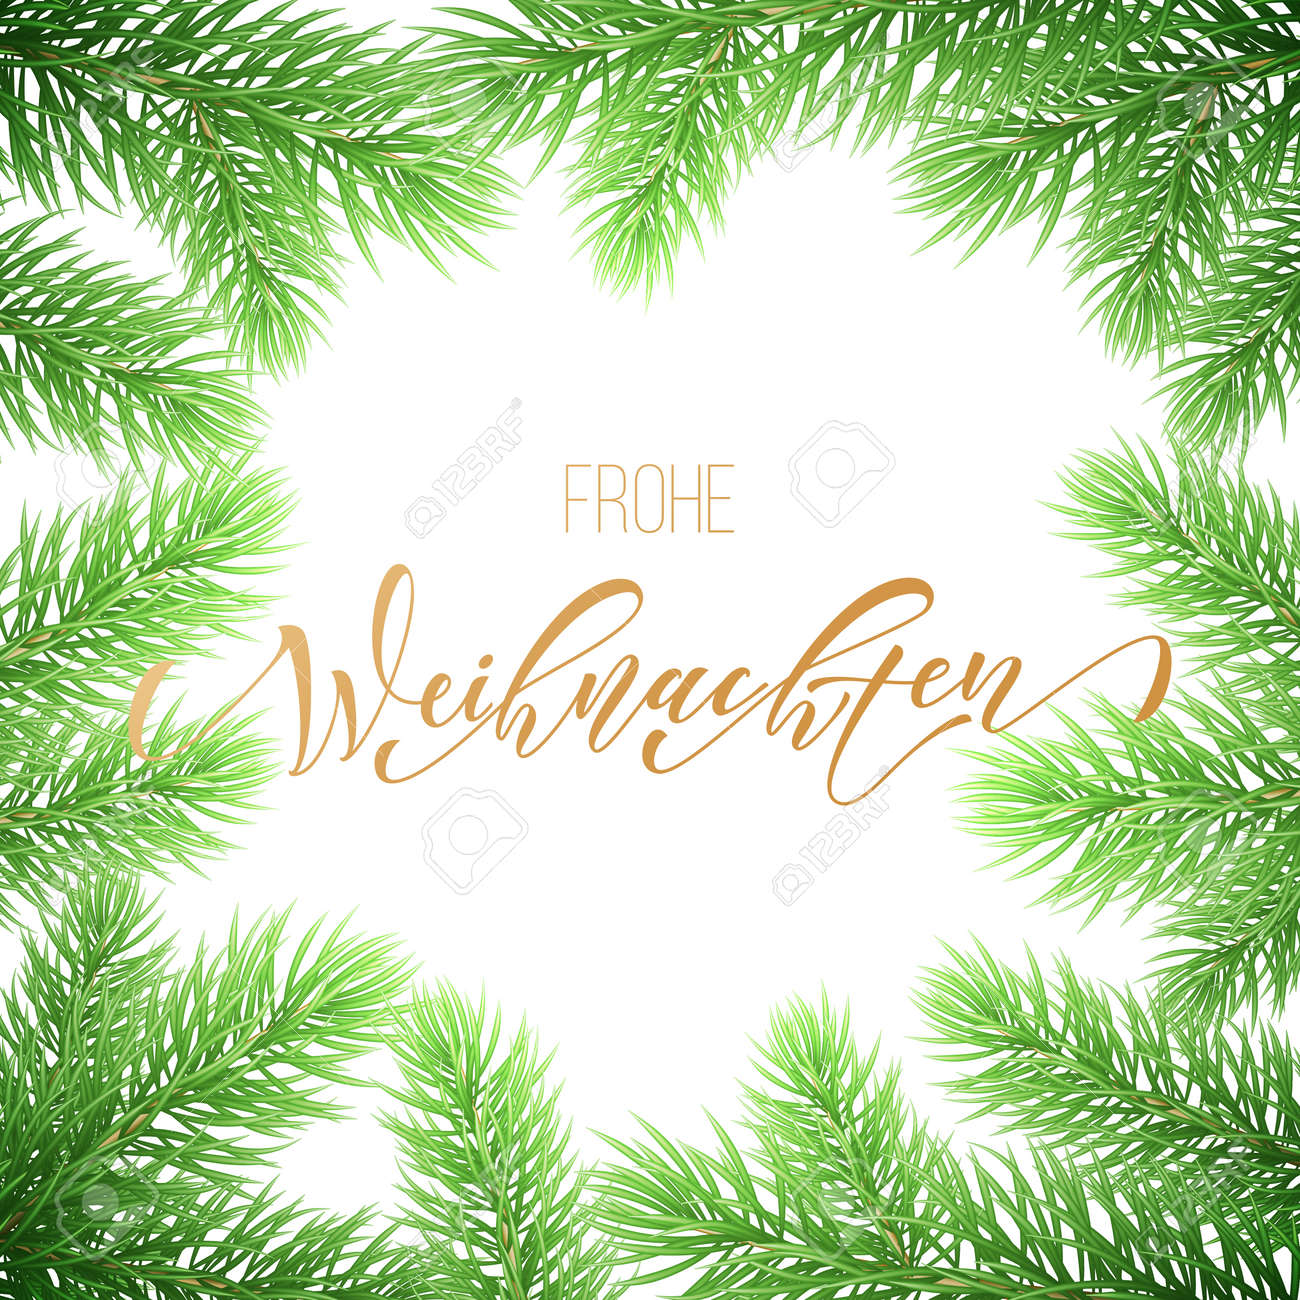 Frohe Weihnachten German Merry Christmas Holiday Golden Hand ...